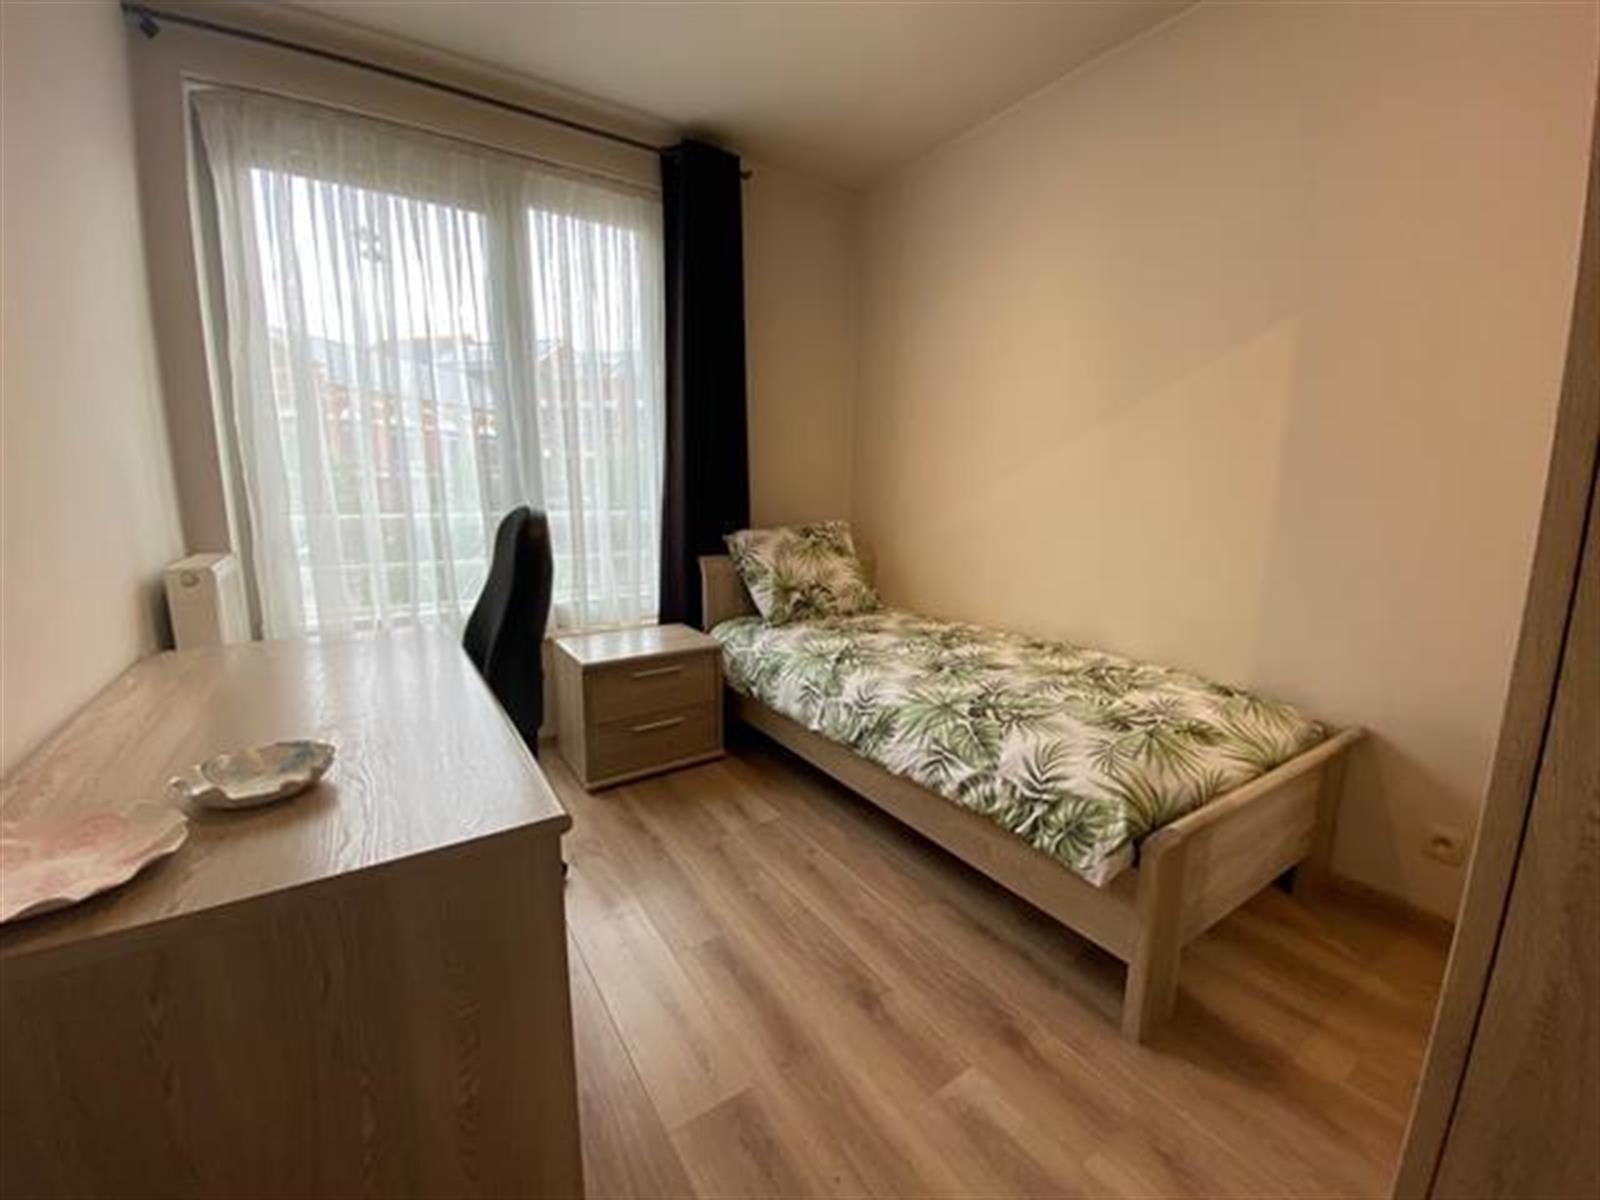 Flat - Etterbeek - #4074391-5